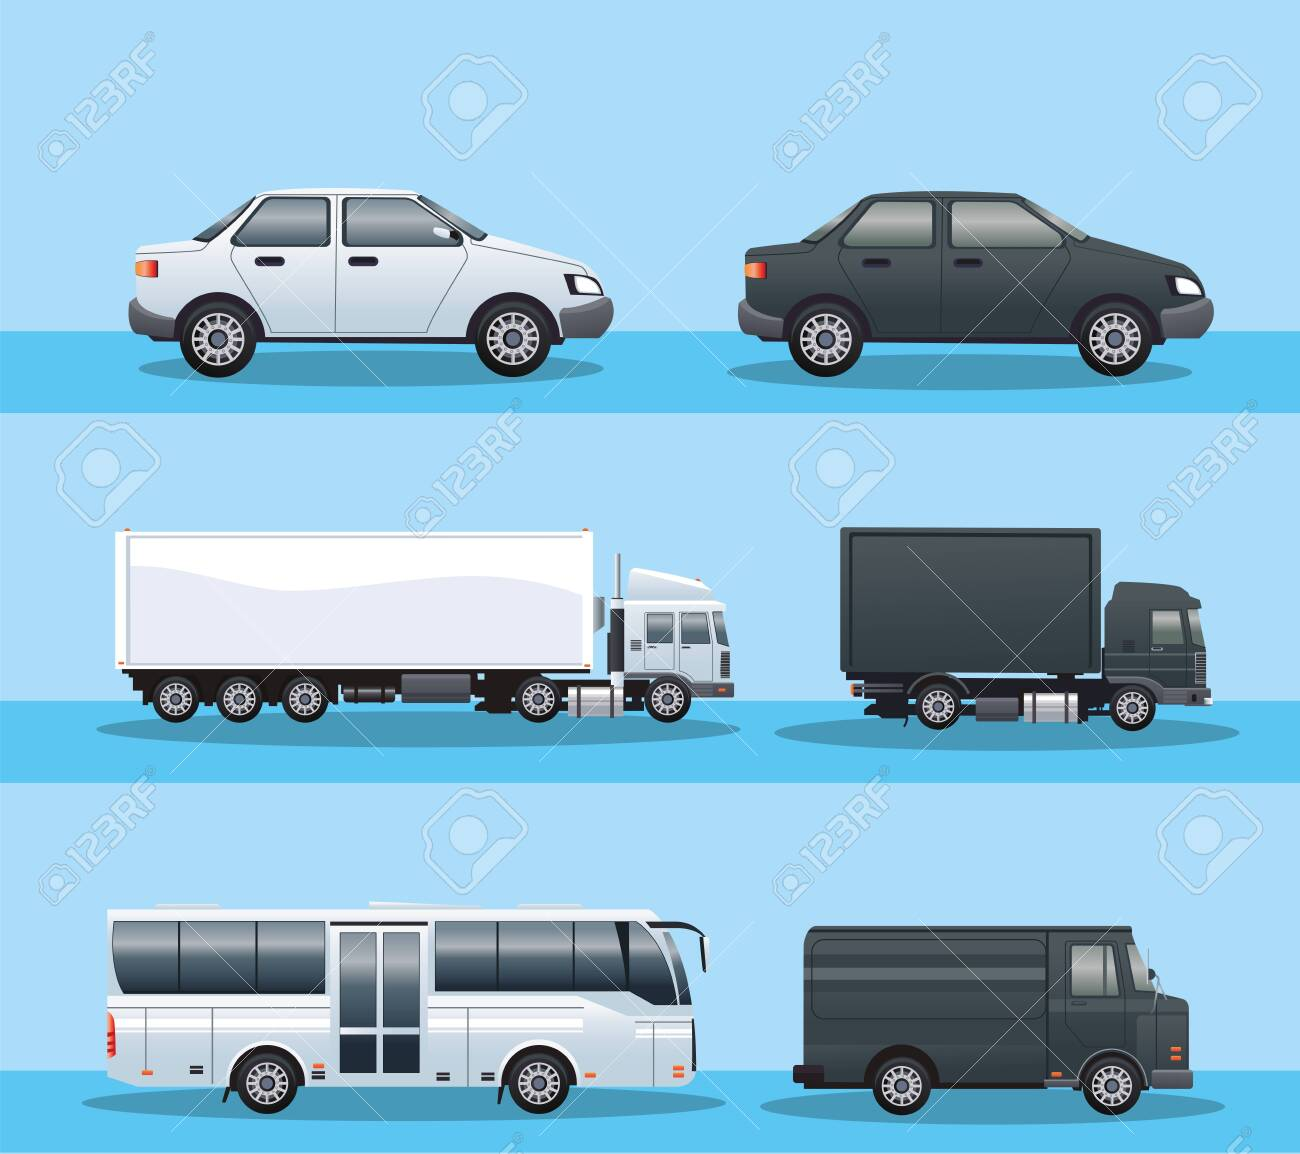 bundle of vehicles transport icons vector illustration design - 152877922